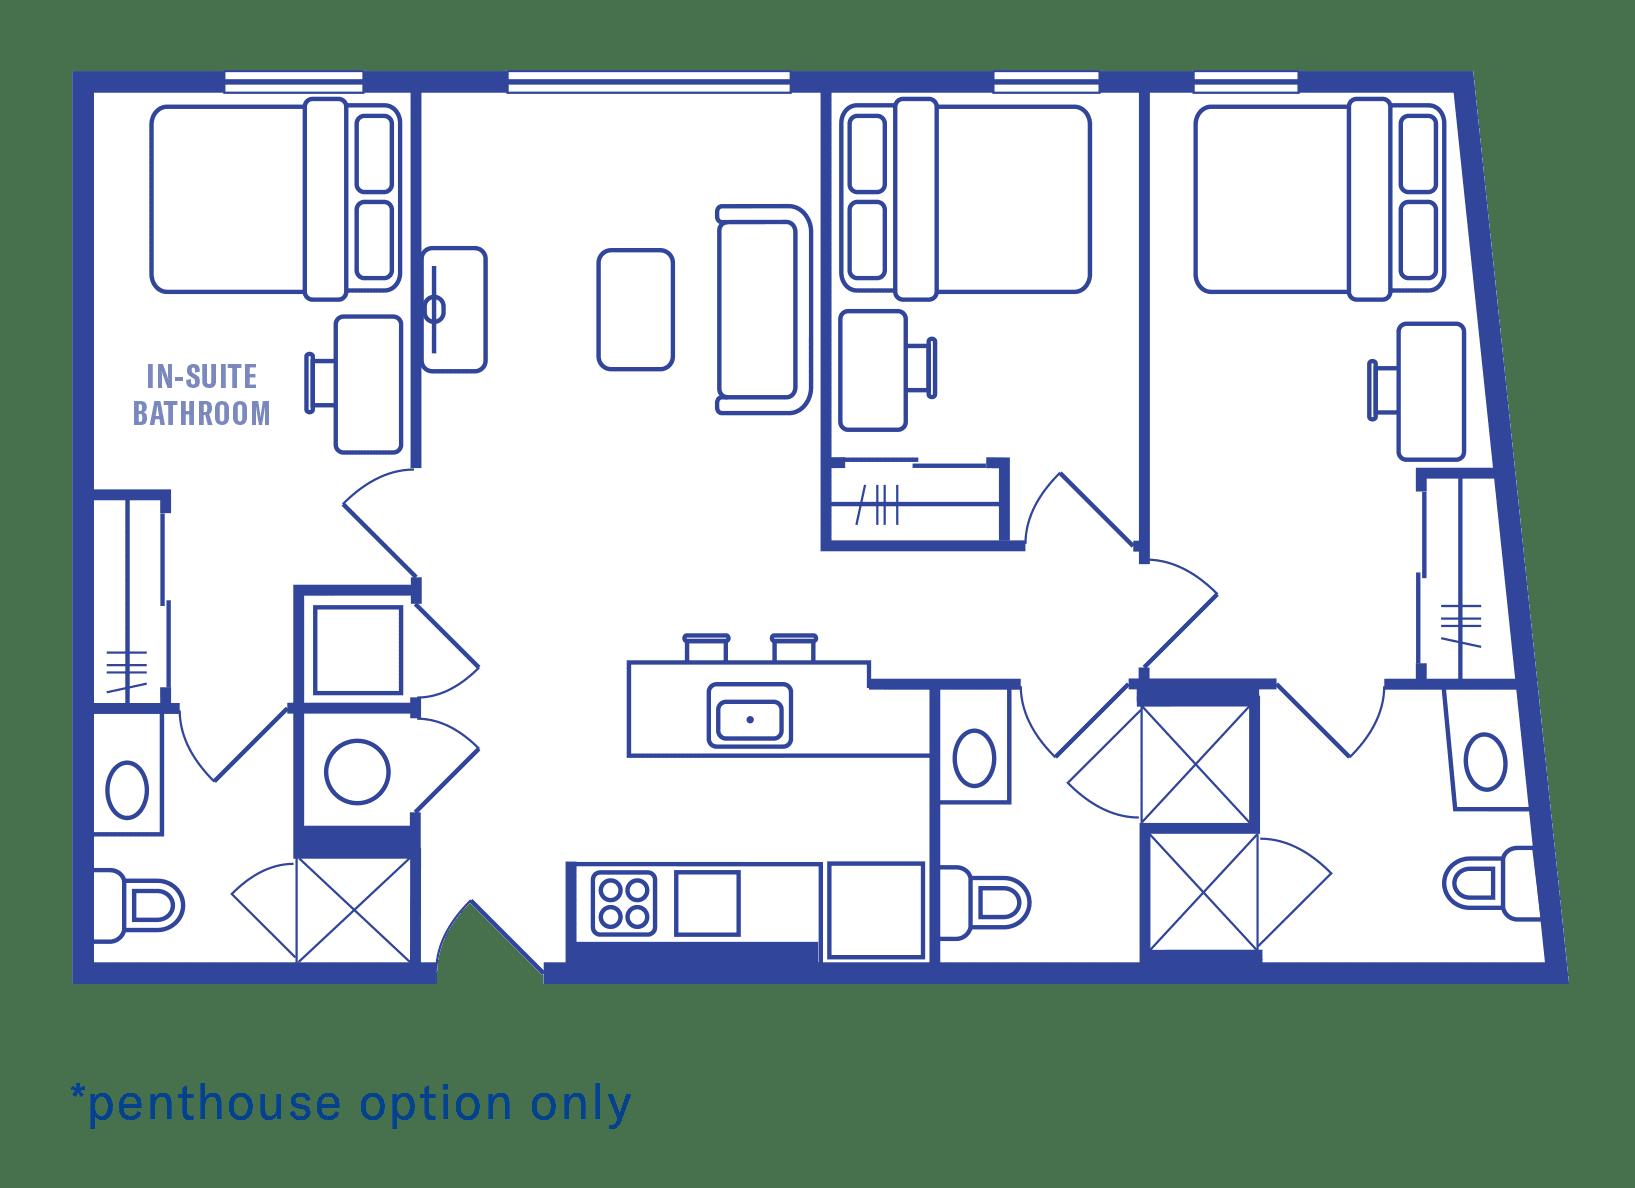 3 Bedroom & 3 Bath Floorplan 2